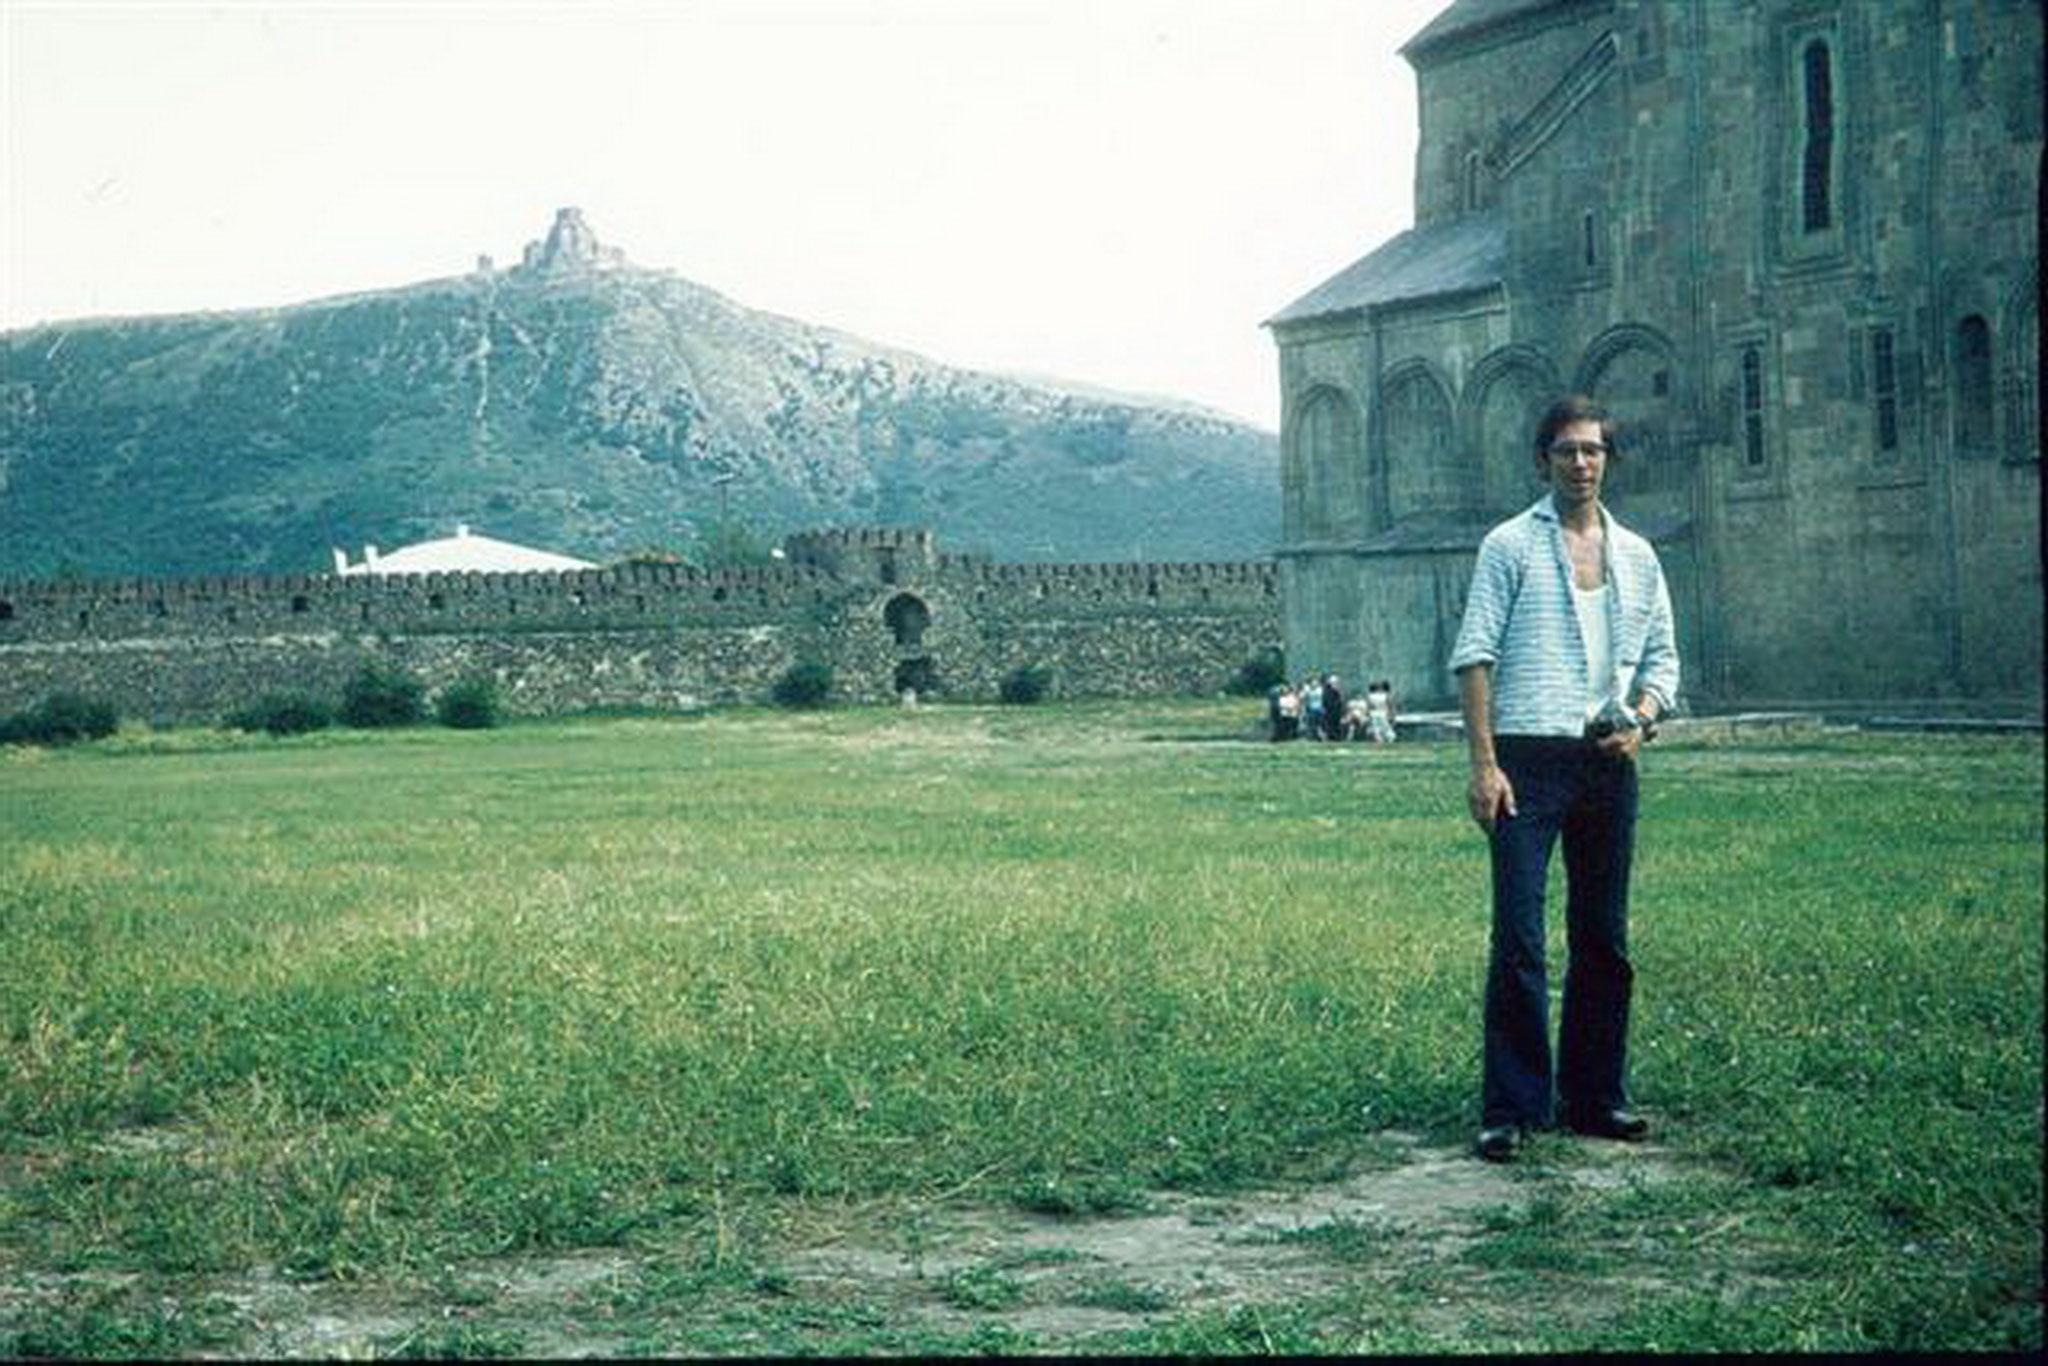 Kloster in Georgien